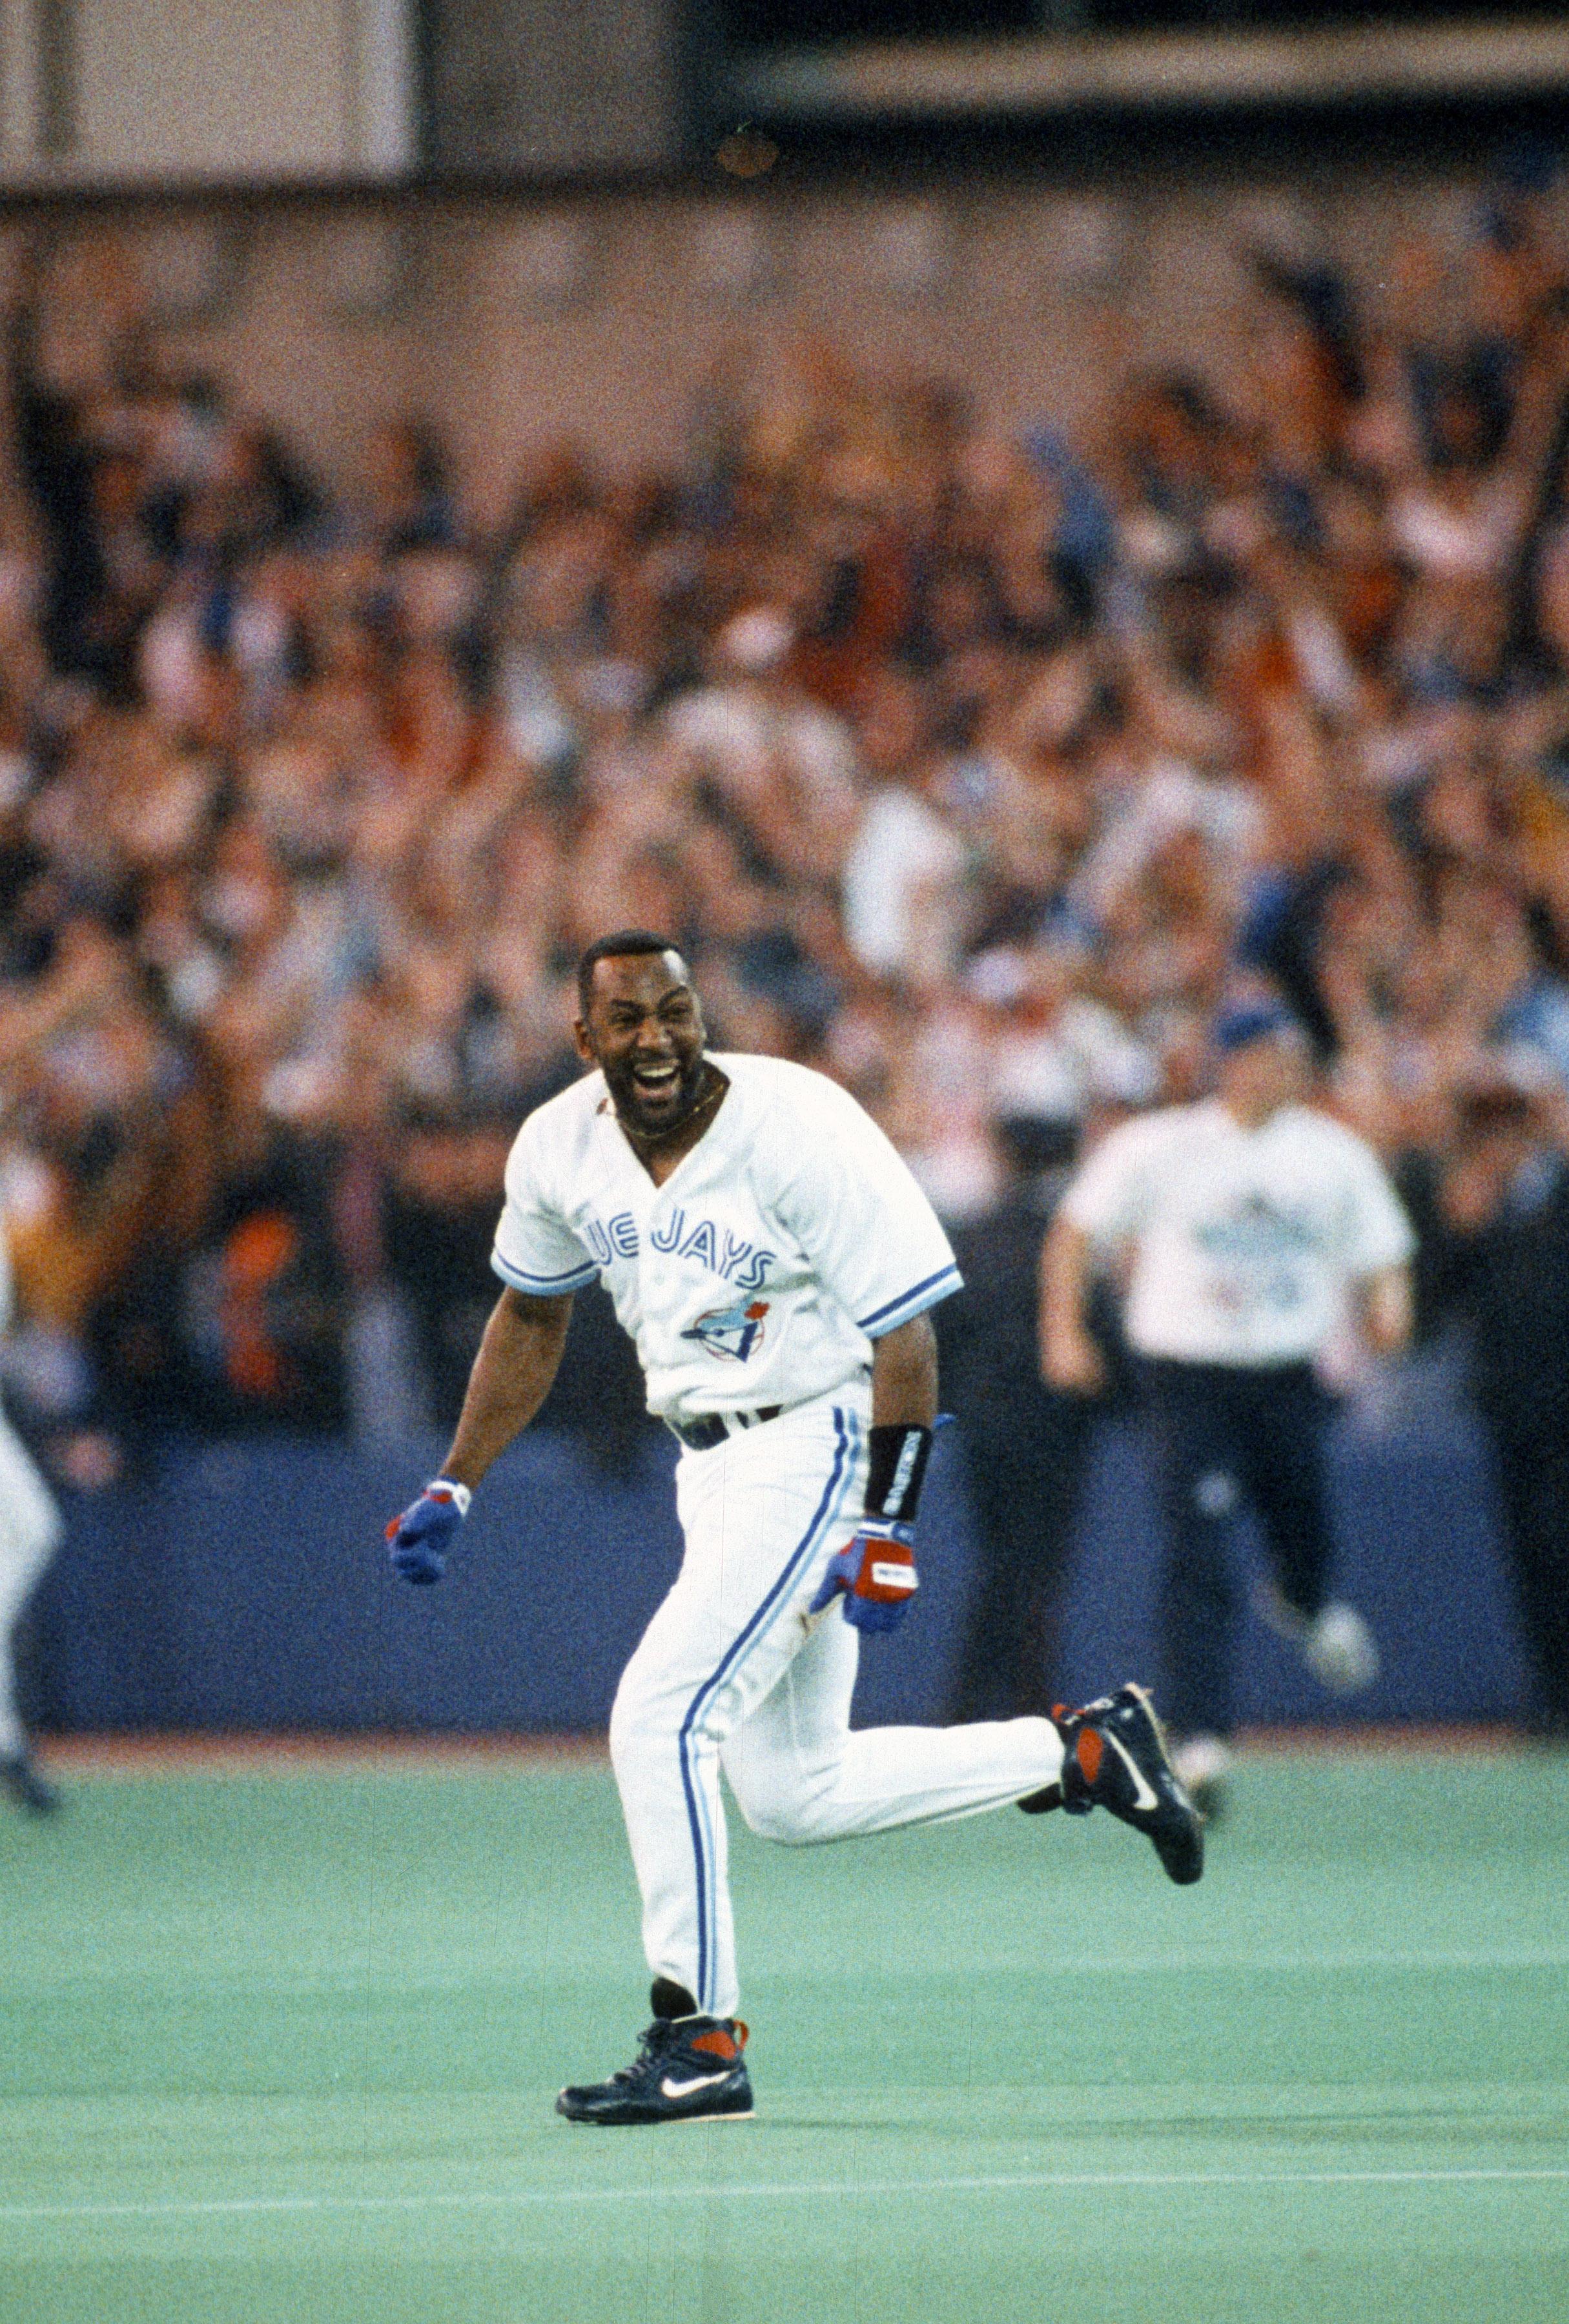 1993 World Series Game 6 - Philadelphia Phillies v Toronto Blue Jays